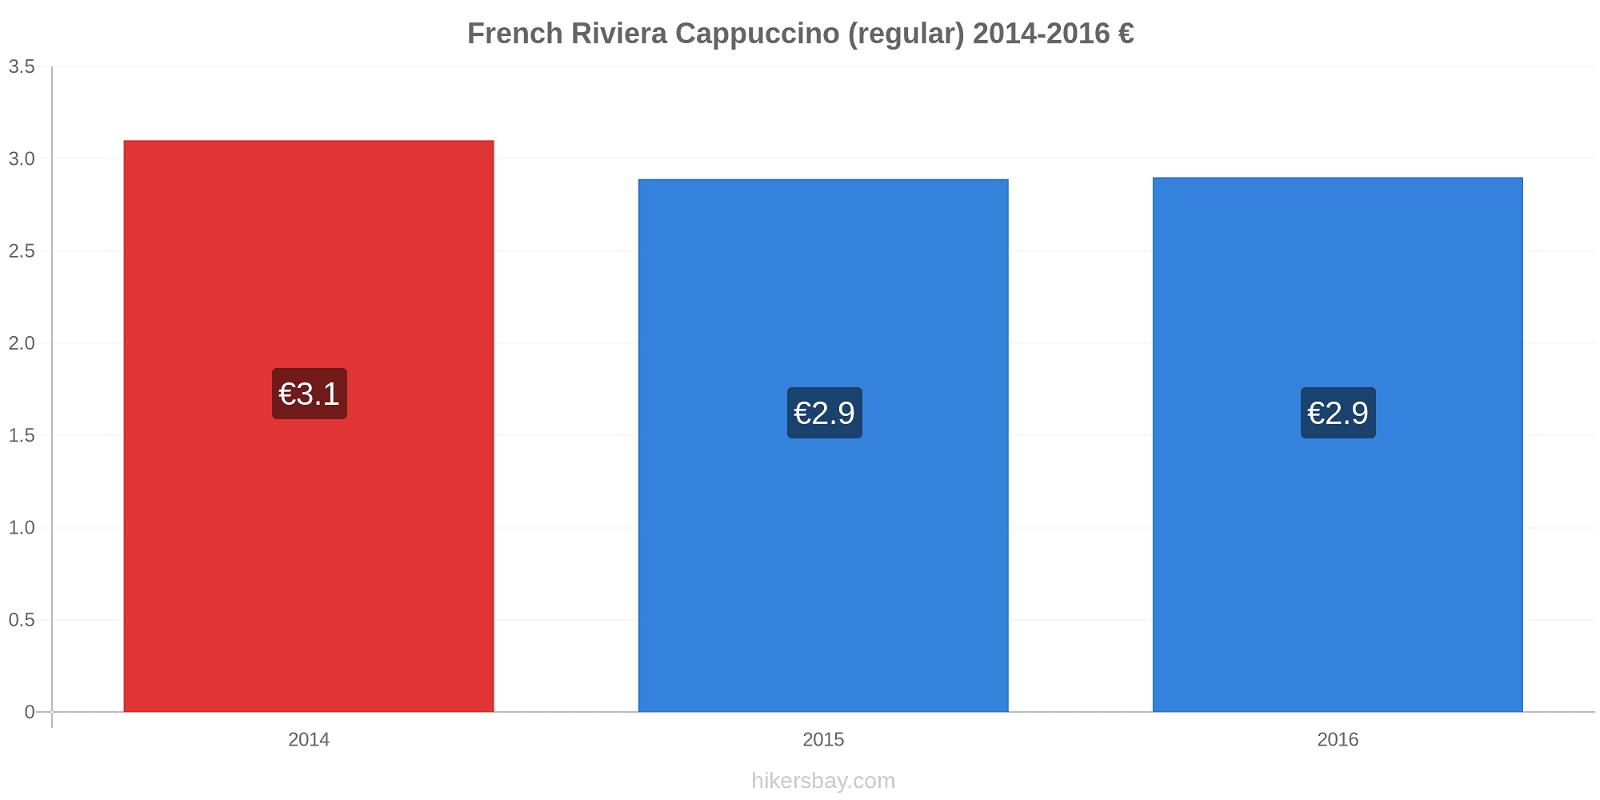 French Riviera price changes Cappuccino (regular) hikersbay.com